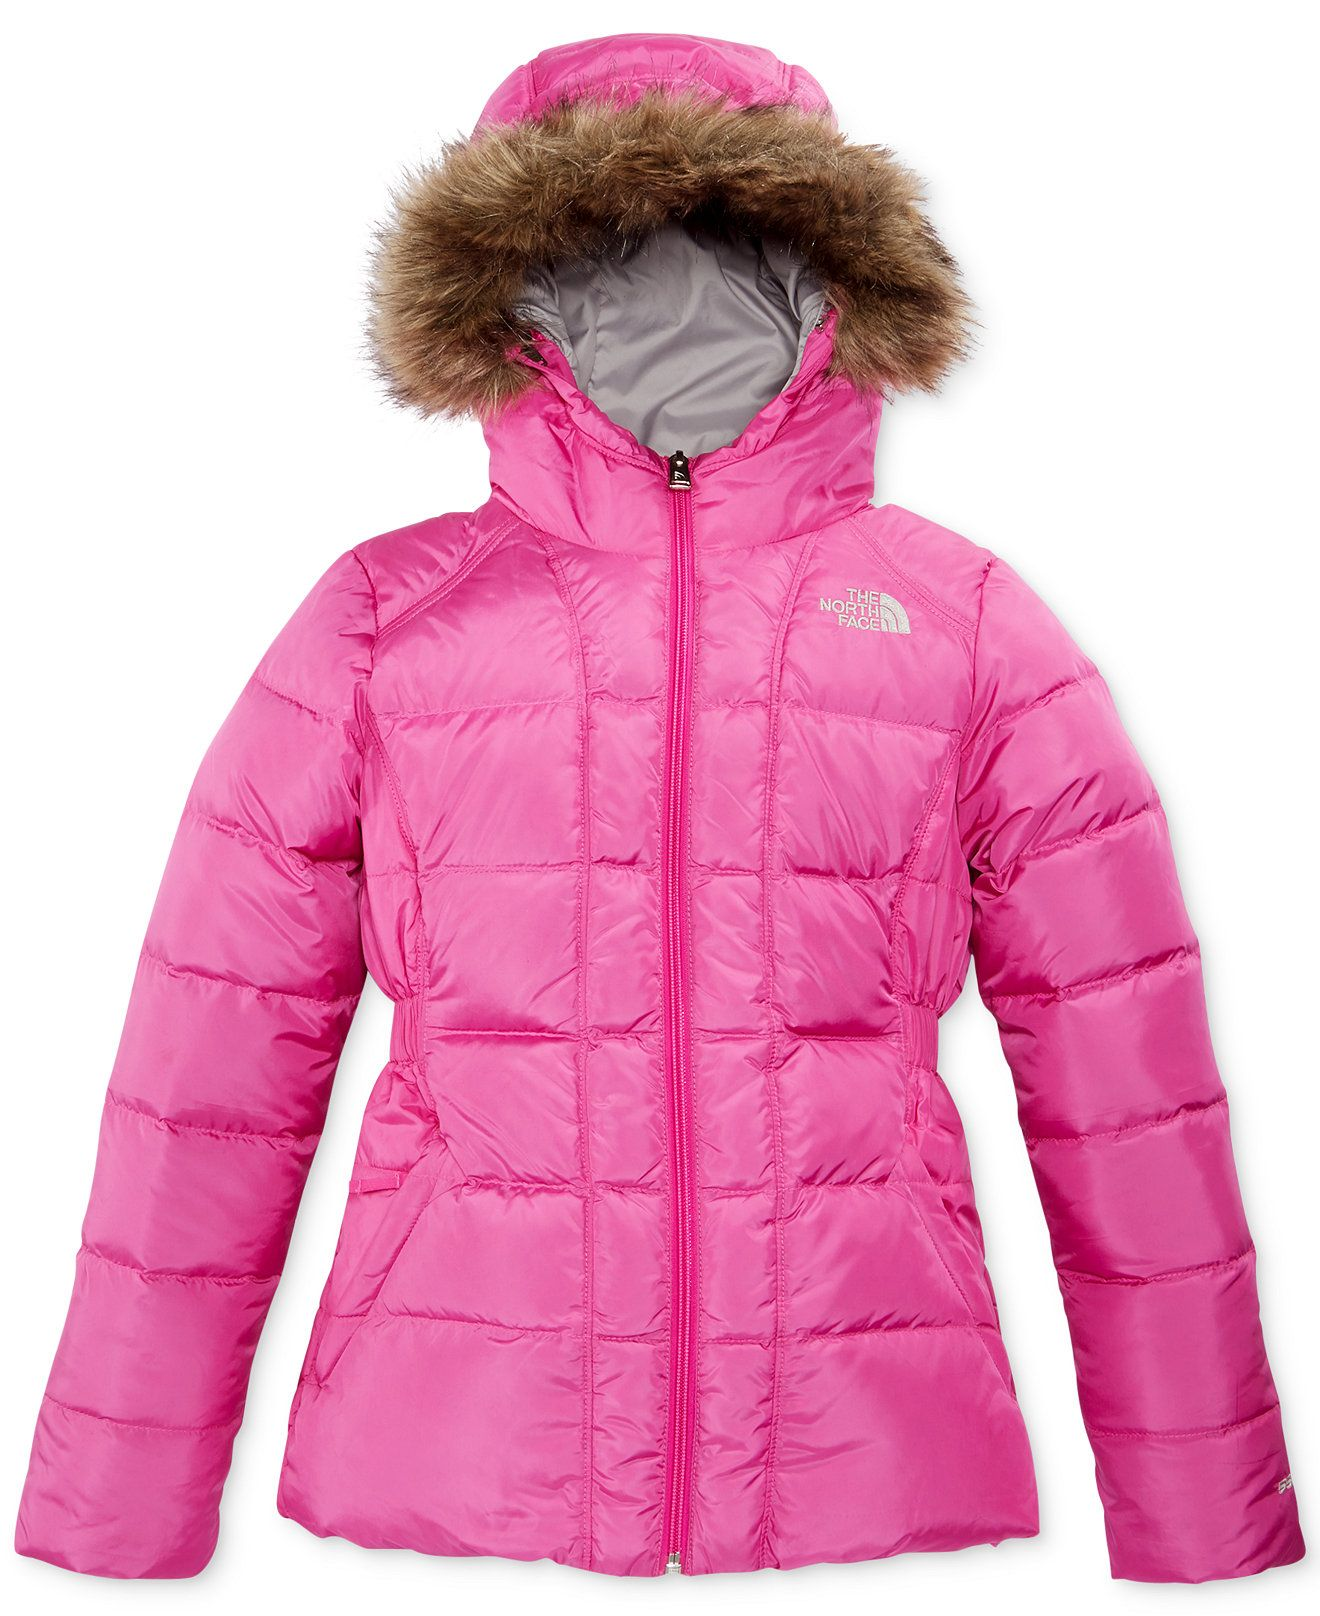 The North Face Toddler Girls Gotham Jacket Kids Macy S North Face Jacket North Face Puffer Jacket Jackets [ 1616 x 1320 Pixel ]